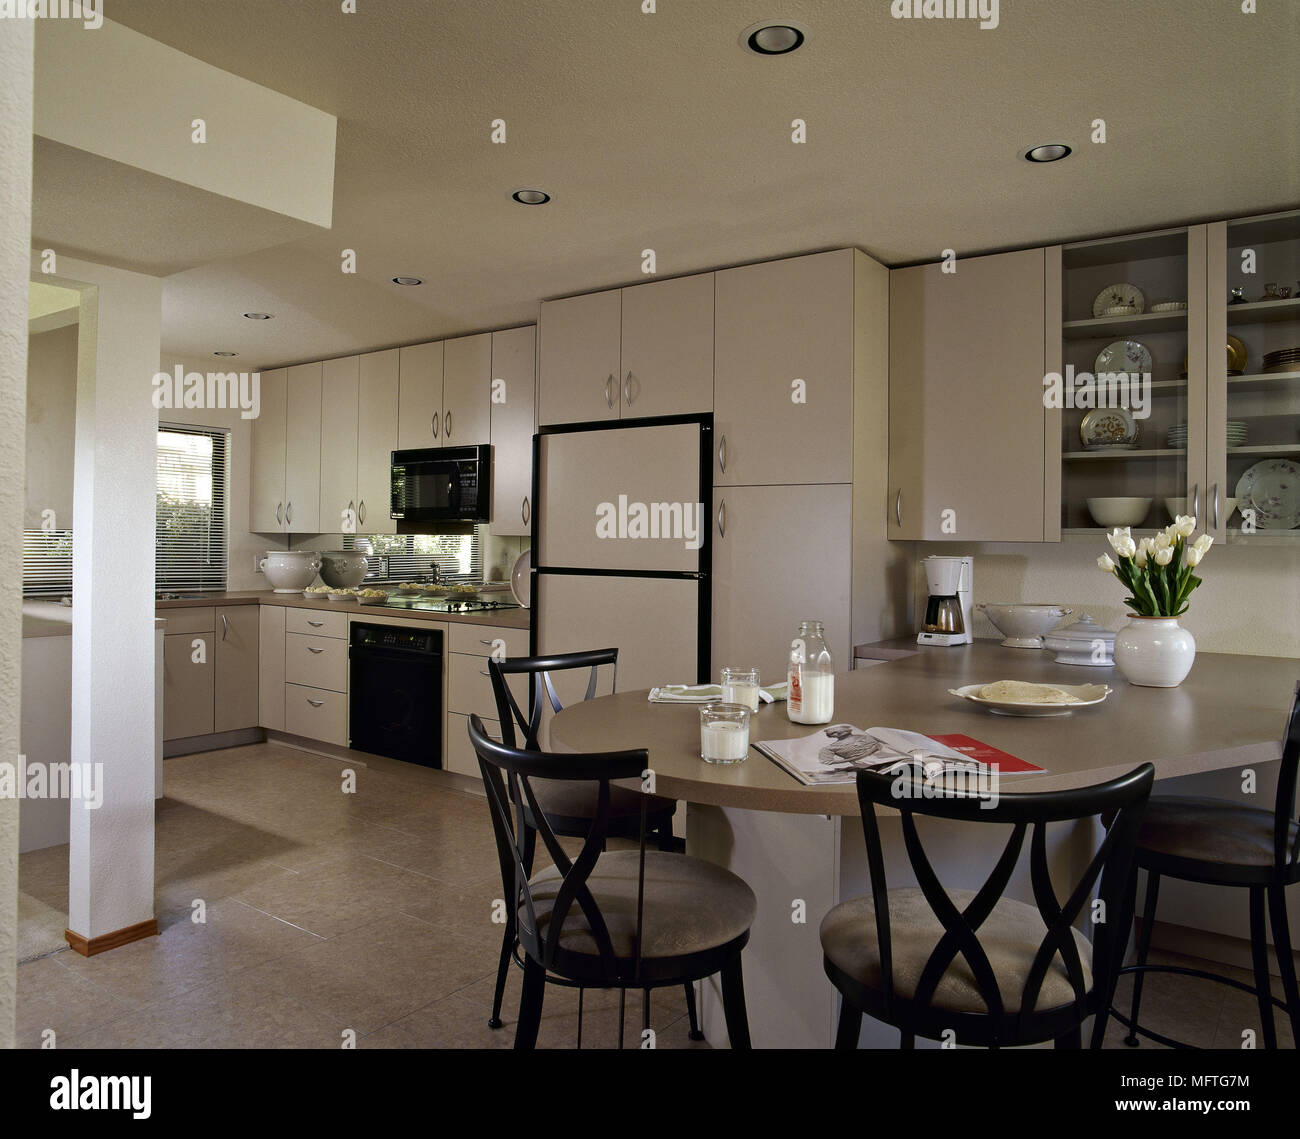 Interiors Modern Cream Kitchens Stock Photos & Interiors